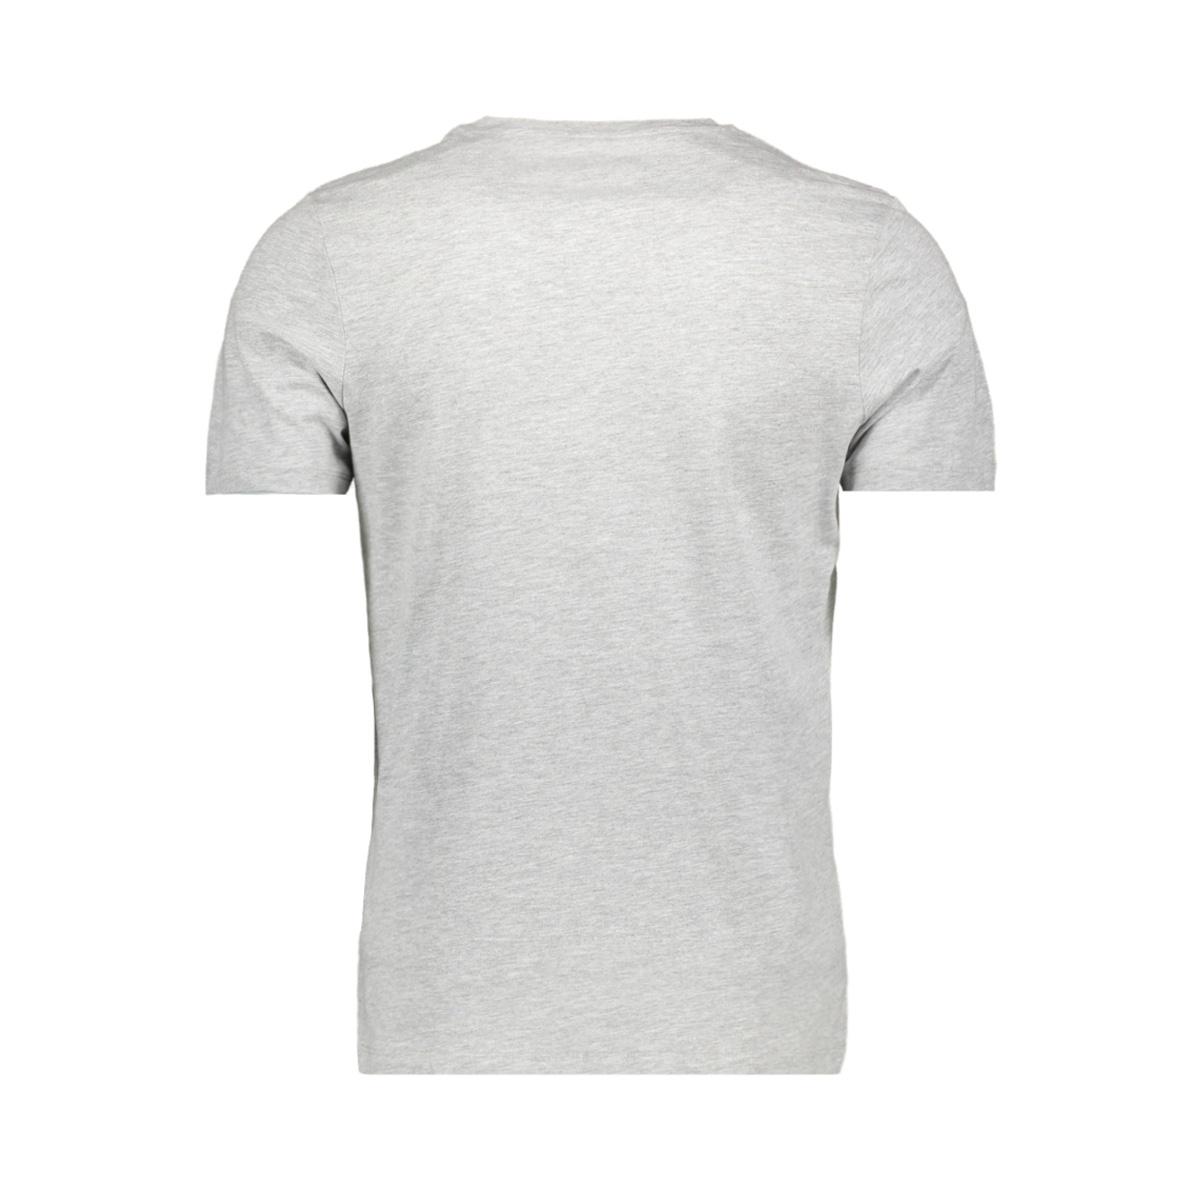 jcobooster  tee ss  crew neck feb 1 12160595 jack & jones t-shirt light grey/mela/slim